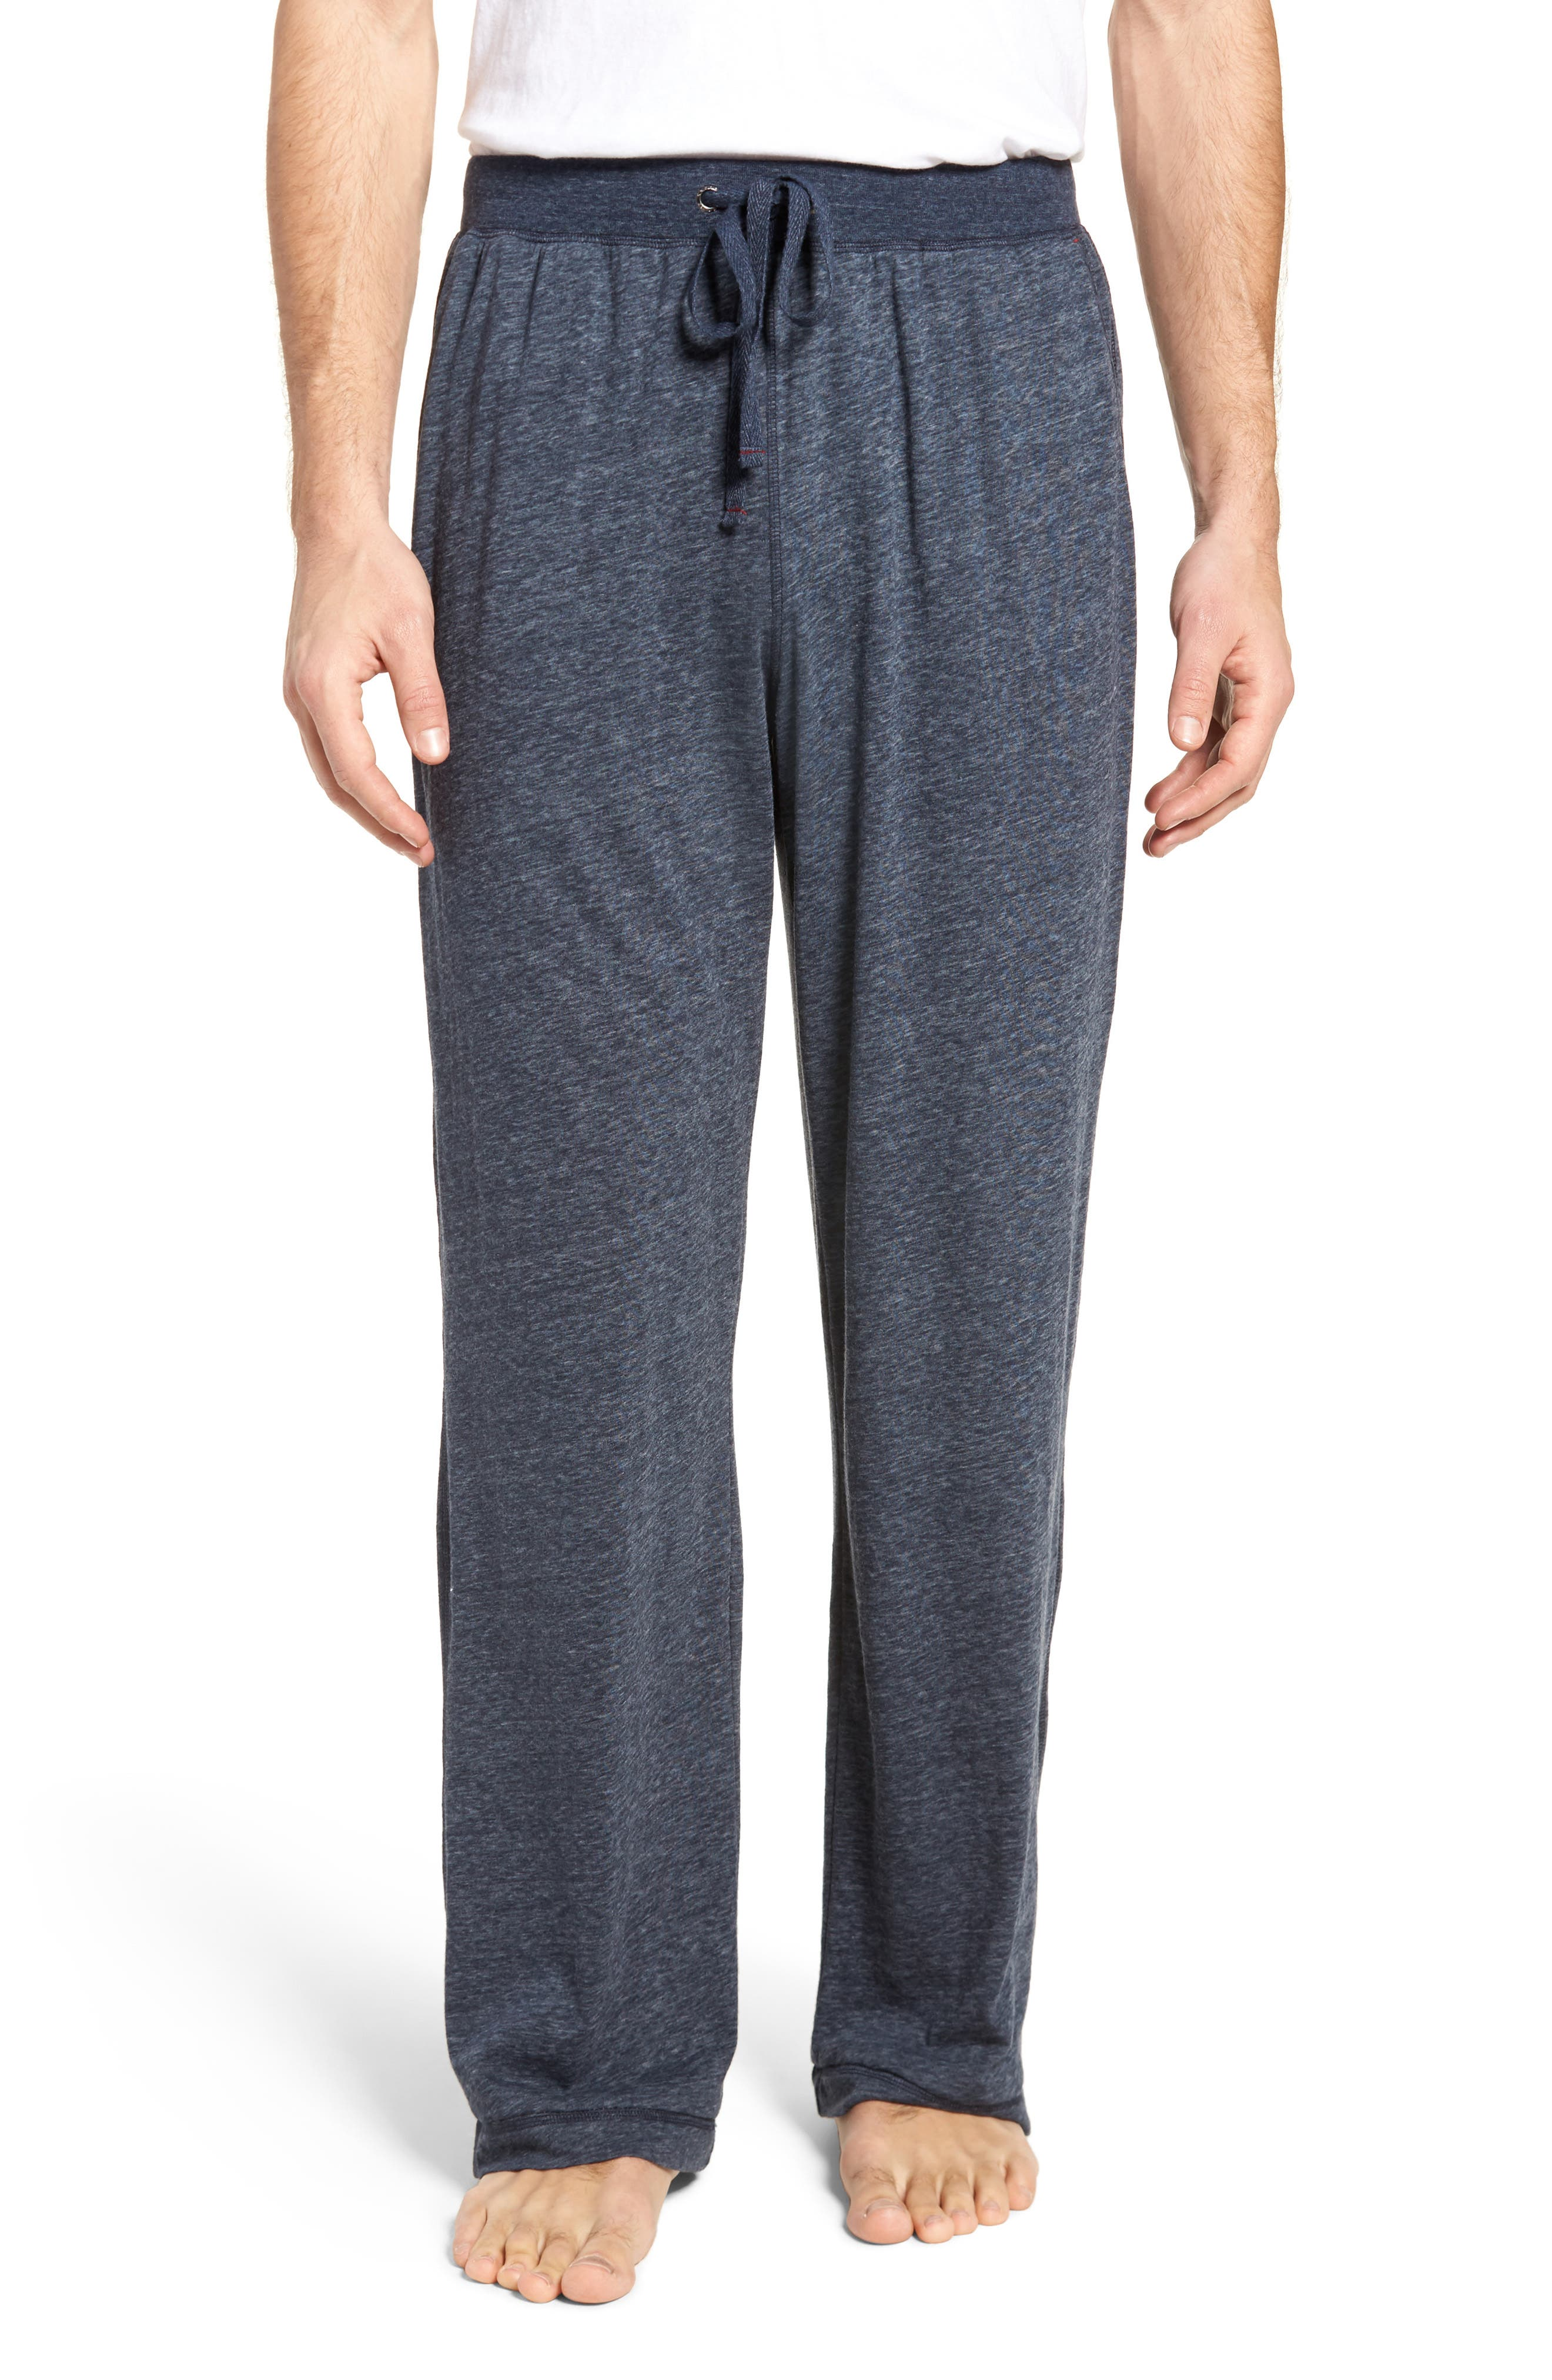 Main Image - Daniel Buchler Recycled Cotton Blend Lounge Pants